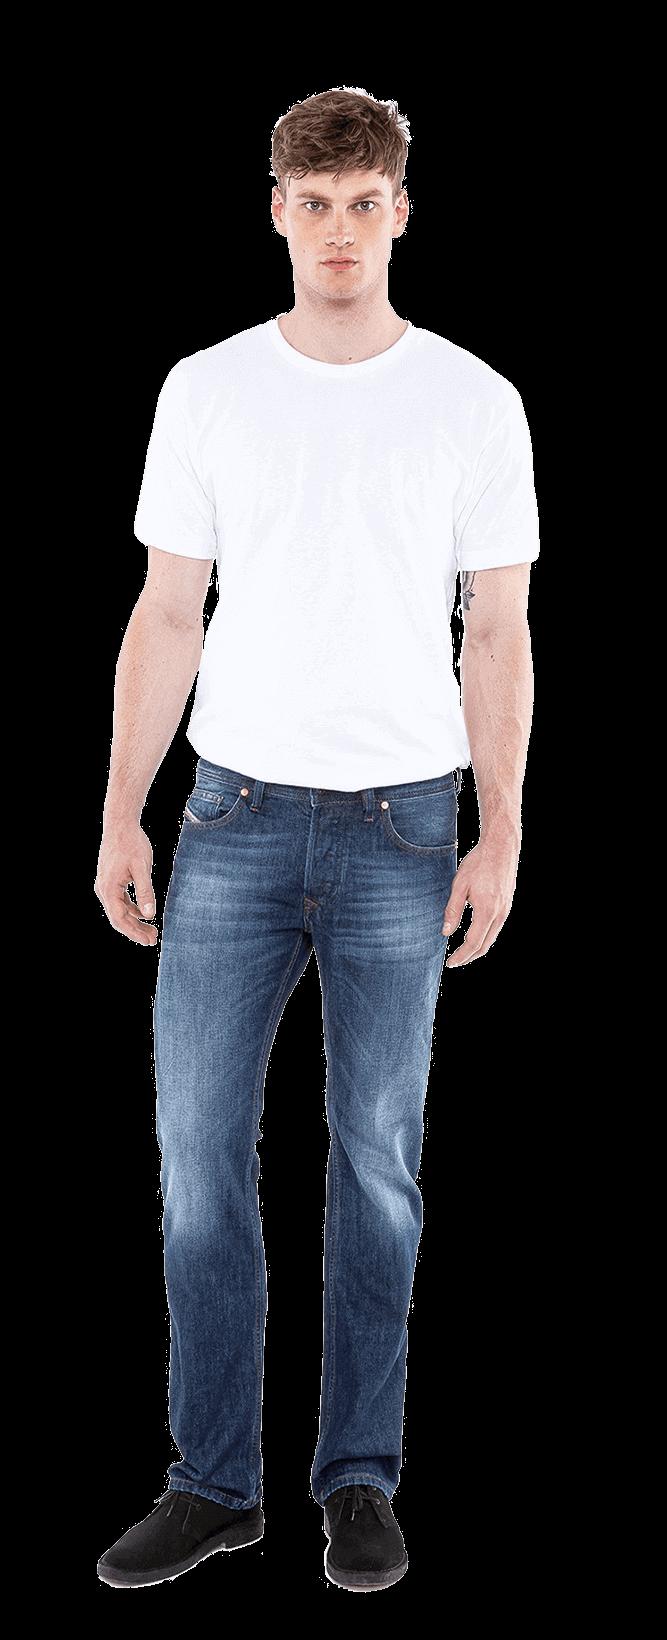 Der Zalando Herren Jeansberater - hier geht s zur Lieblingsjeans! 1ec0294113